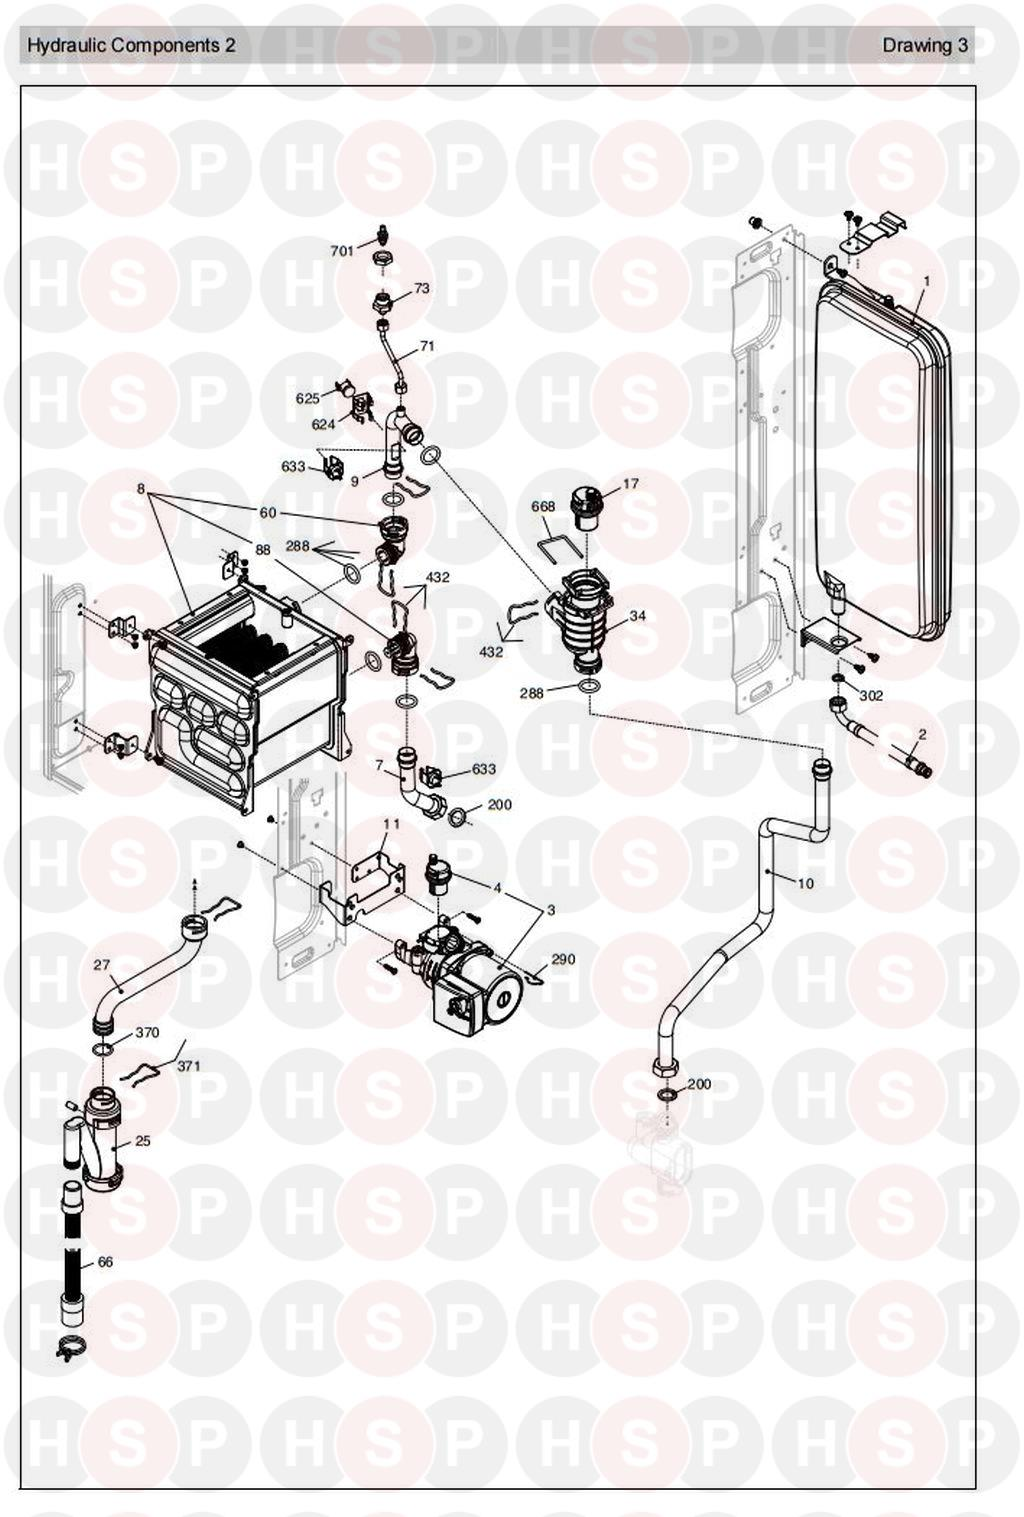 vokera sabre 25he plus  new version   hydraulics 2  diagram